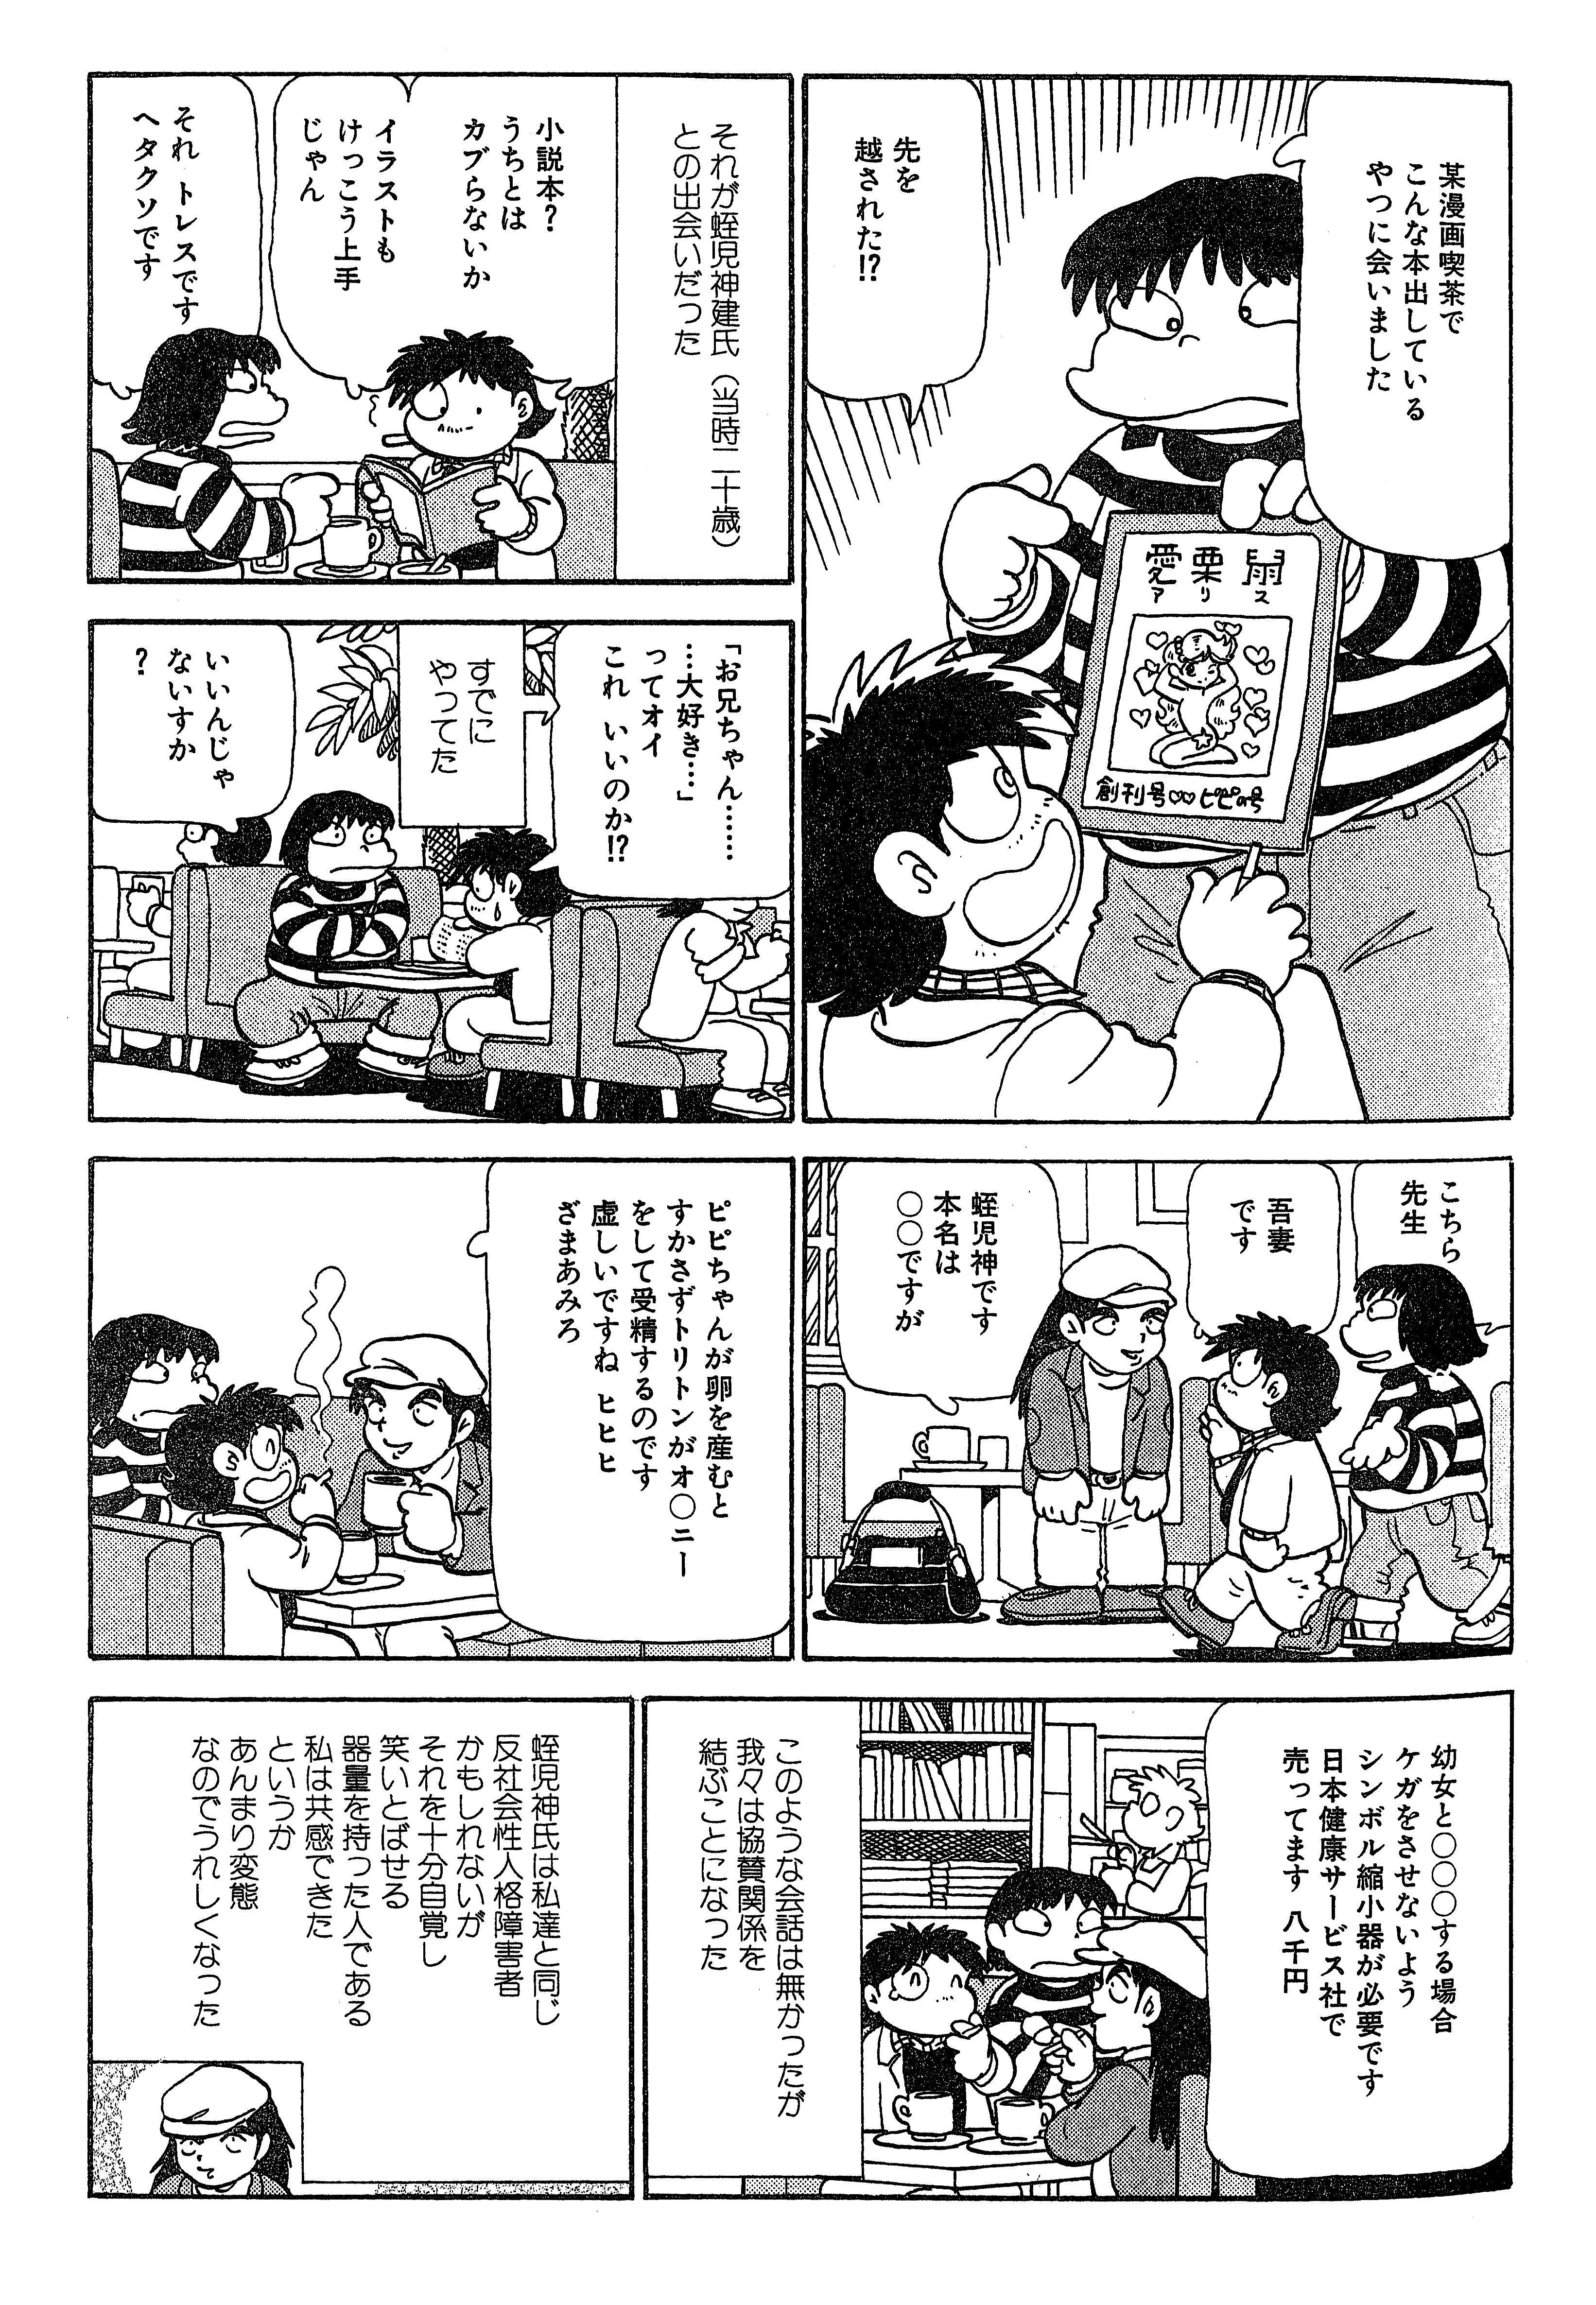 f:id:kougasetumei:20190930234251p:image